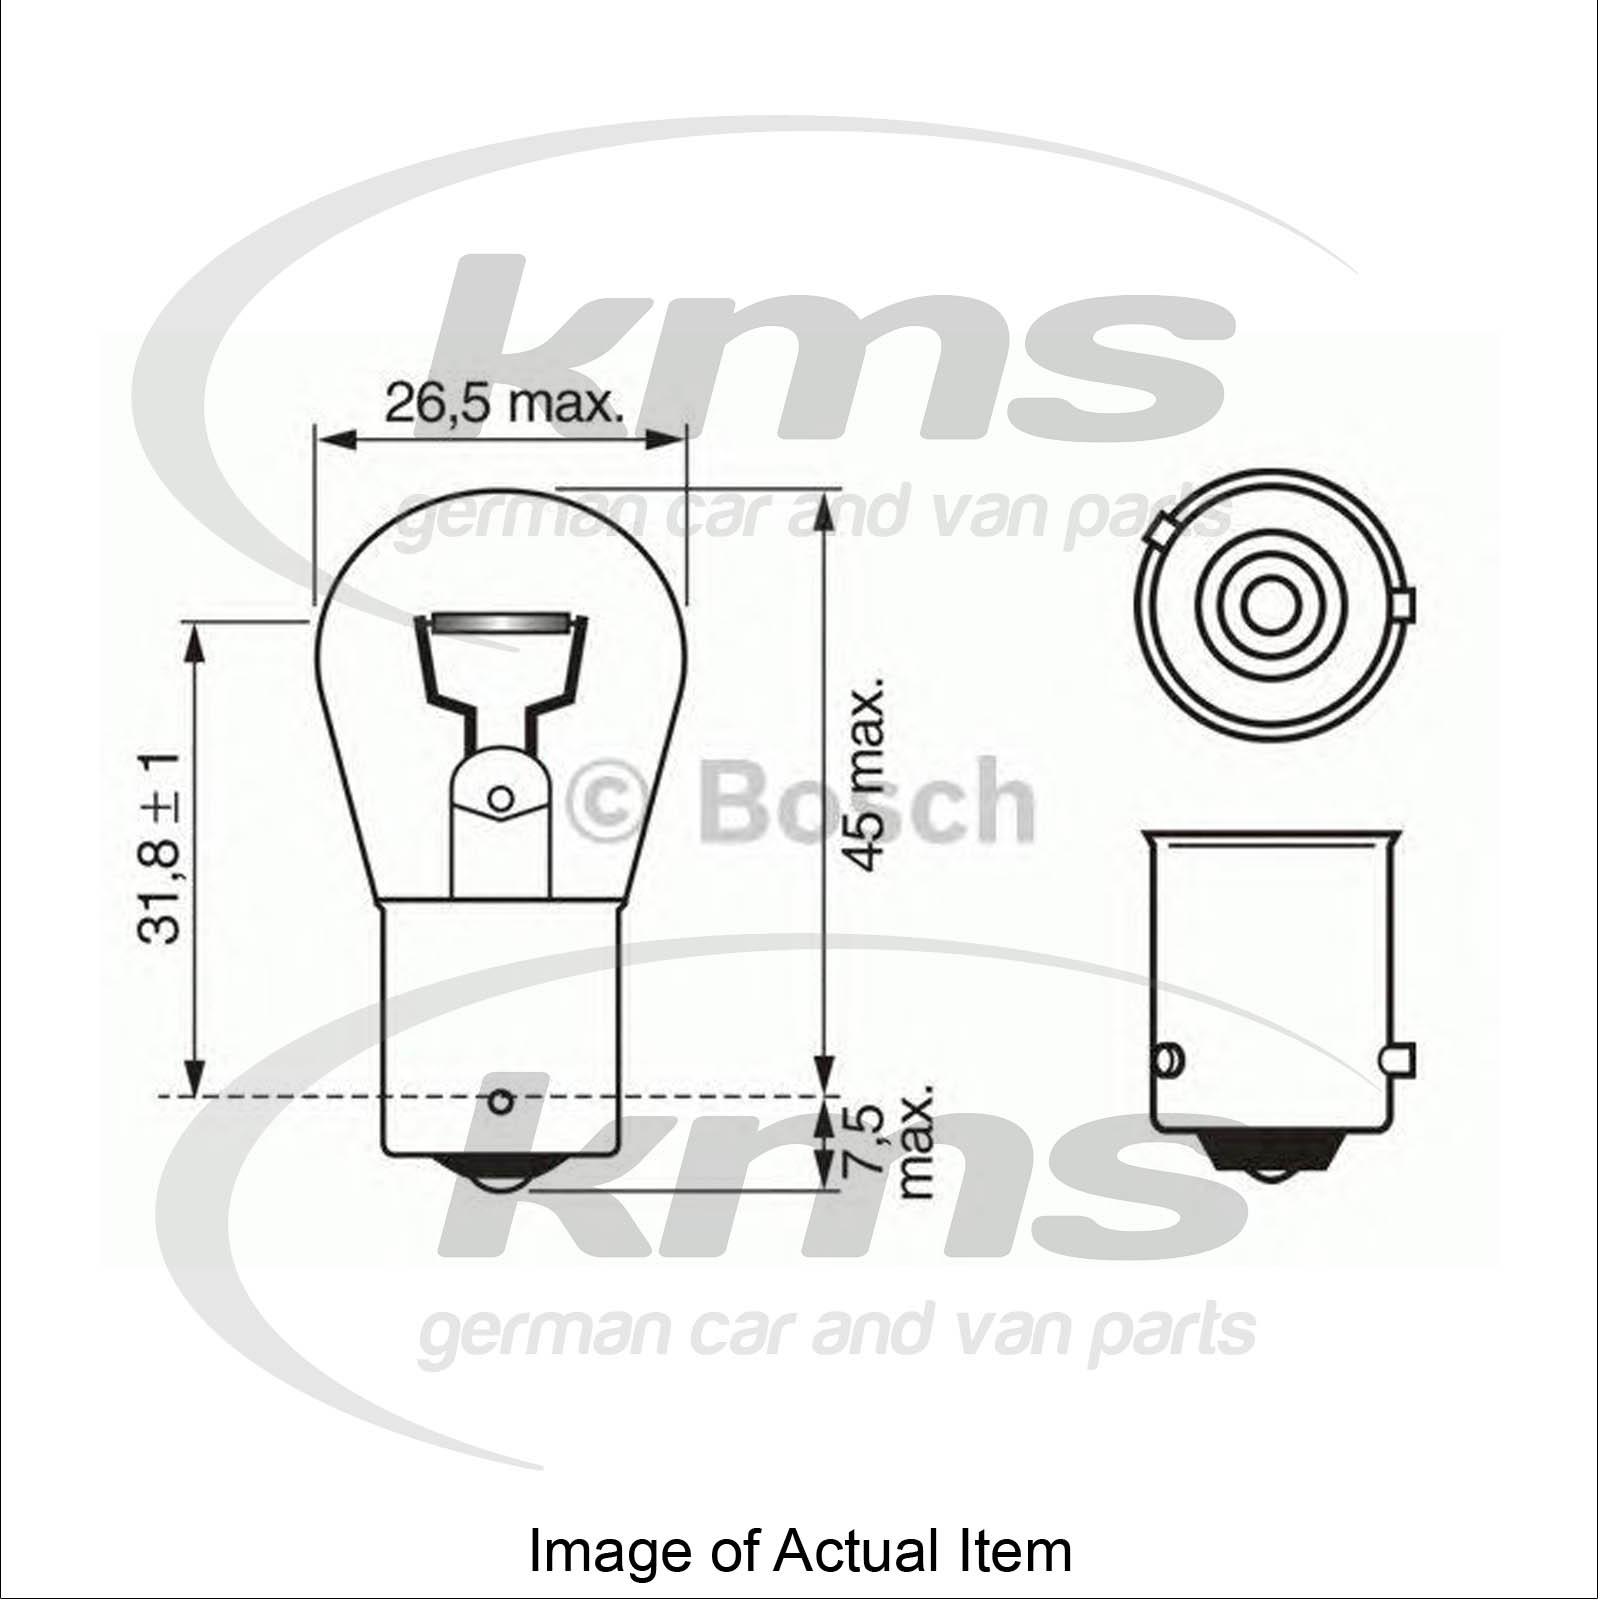 Bulb For Indicator Mercedes M Class W163 Ml 320 163 154 Closed Off Road Vehi